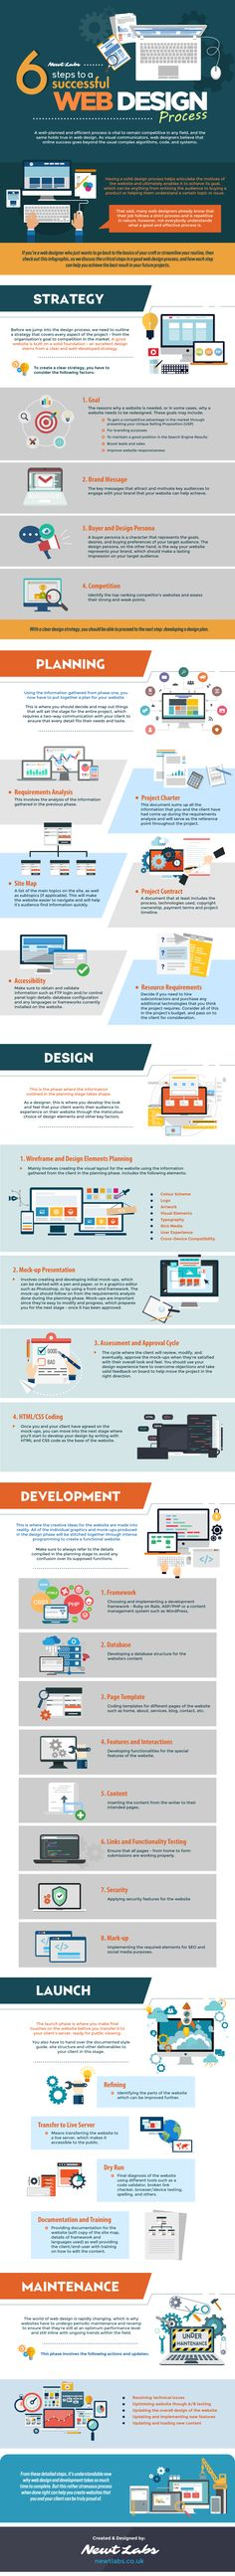 6 Steps To A Successful Web Design